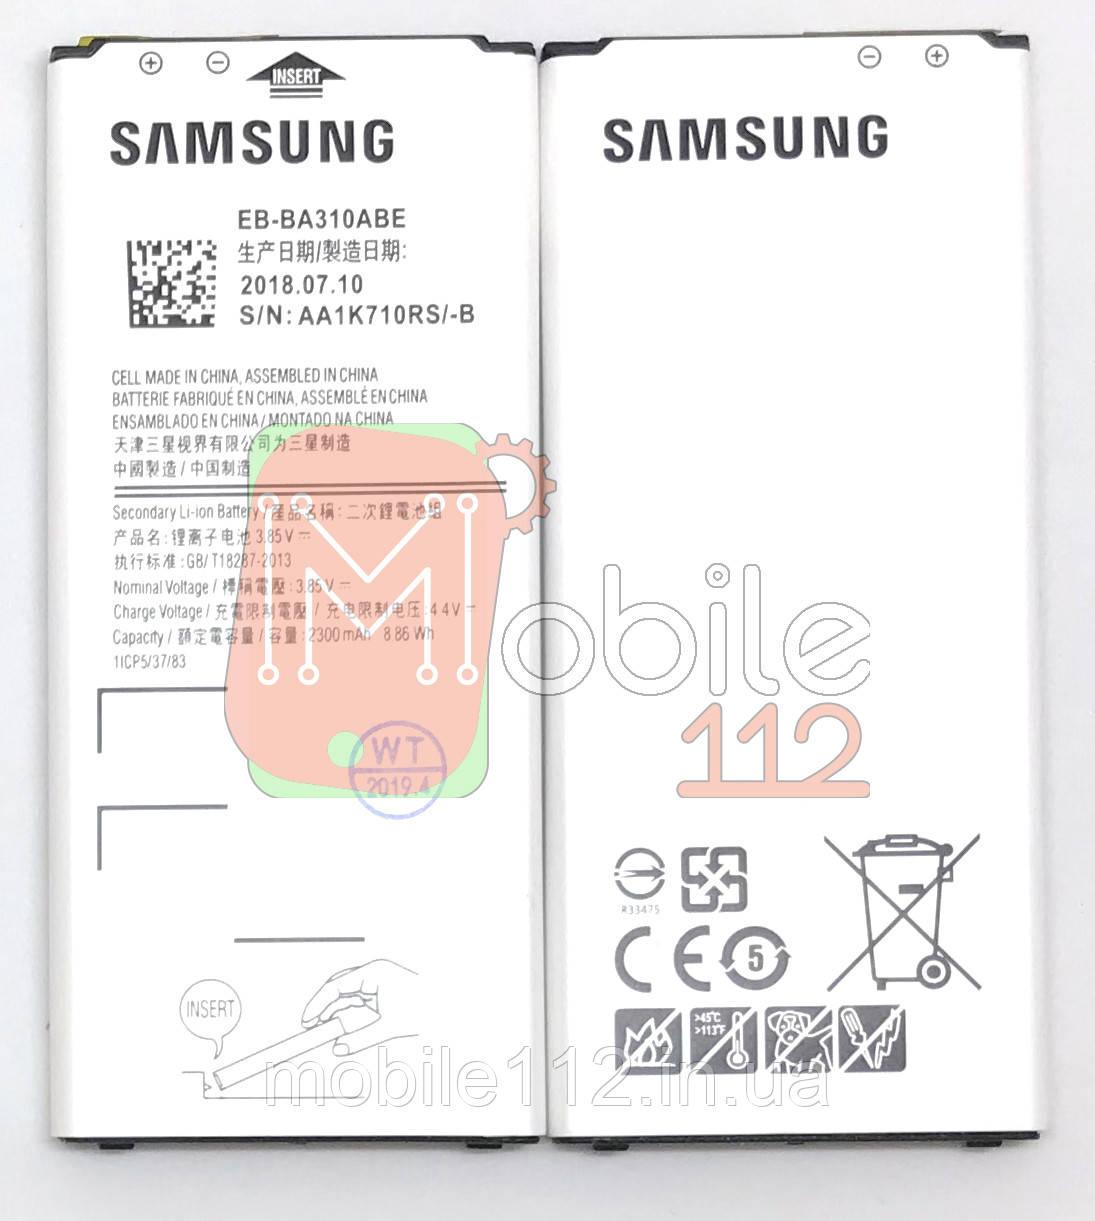 Аккумулятор (АКБ батарея) Samsung EB-BA310ABE оригинал Китай Galaxy A3 2016 A310F 2300 mAh